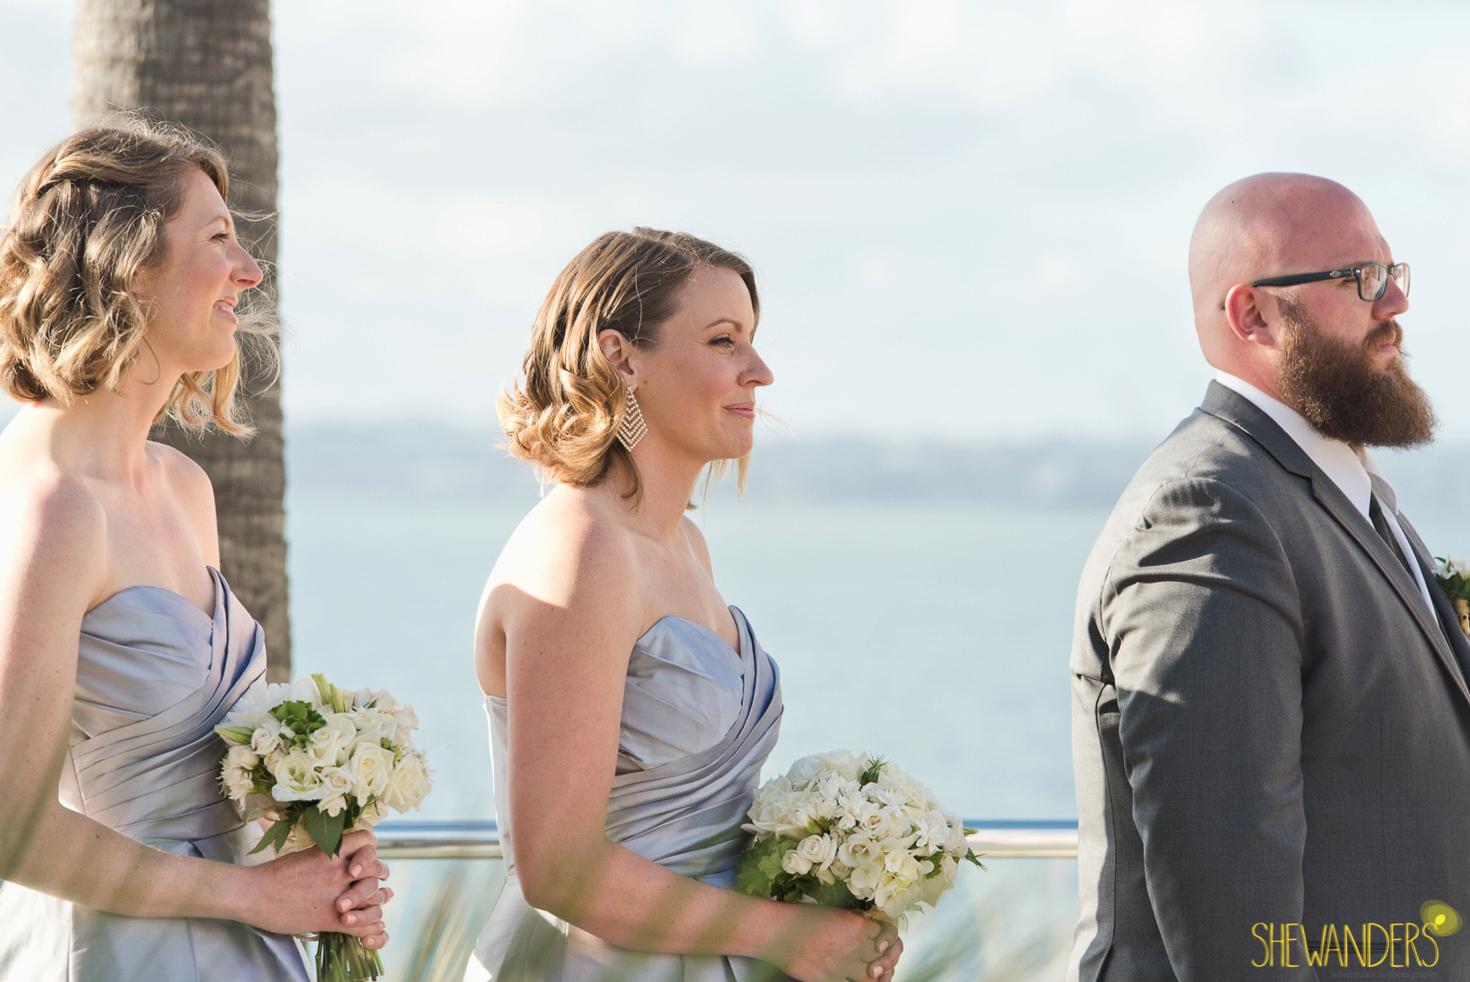 Shewanders.Coronado.Wedding.LaurenJessica-1024.jpg.Wedding.LaurenJessica-1024.jpg